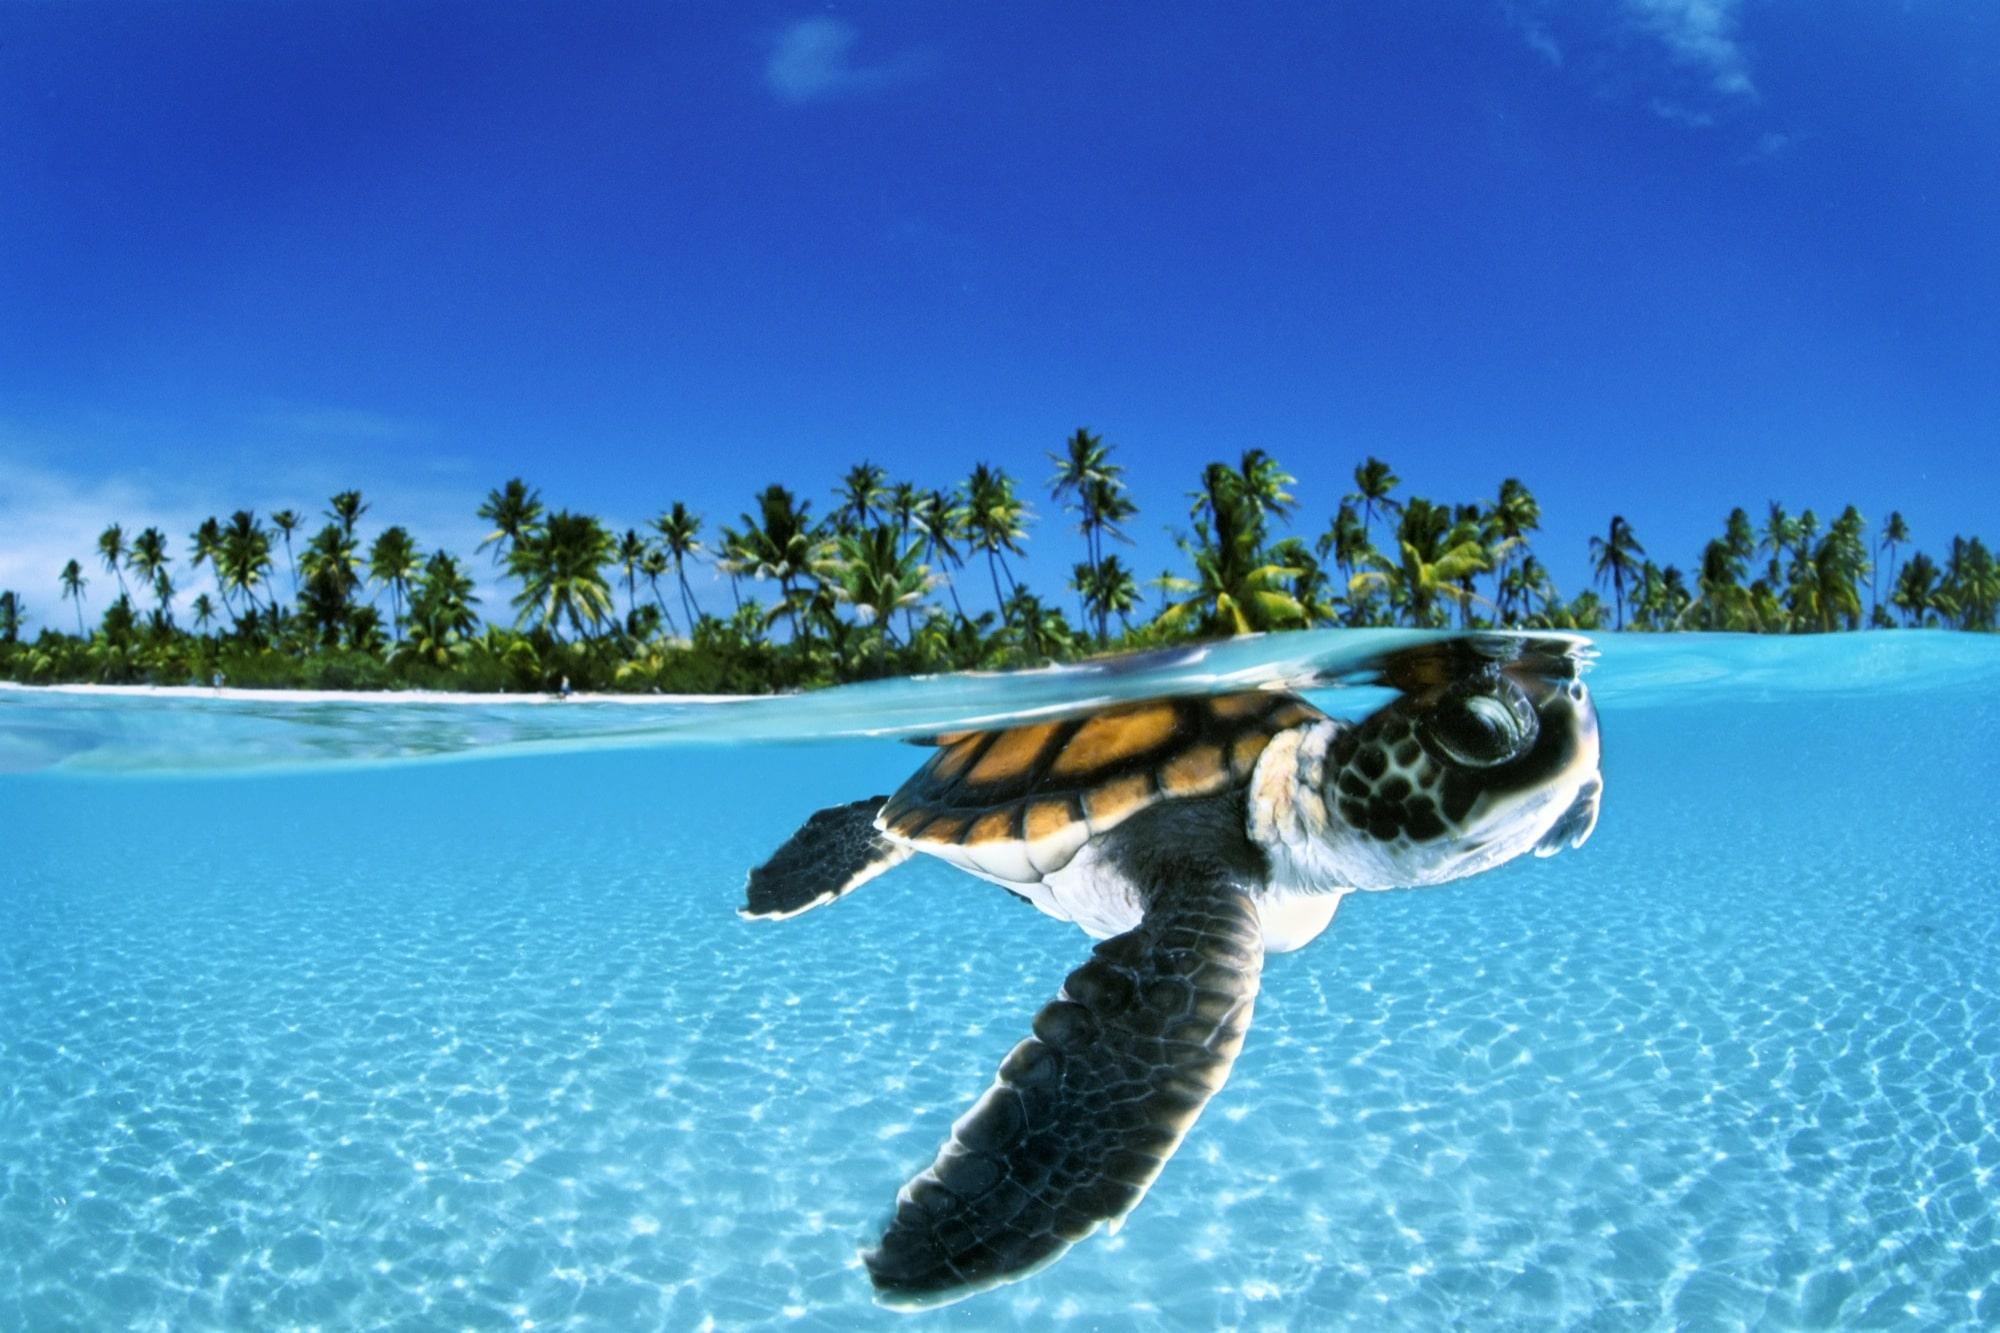 Half underwater picture